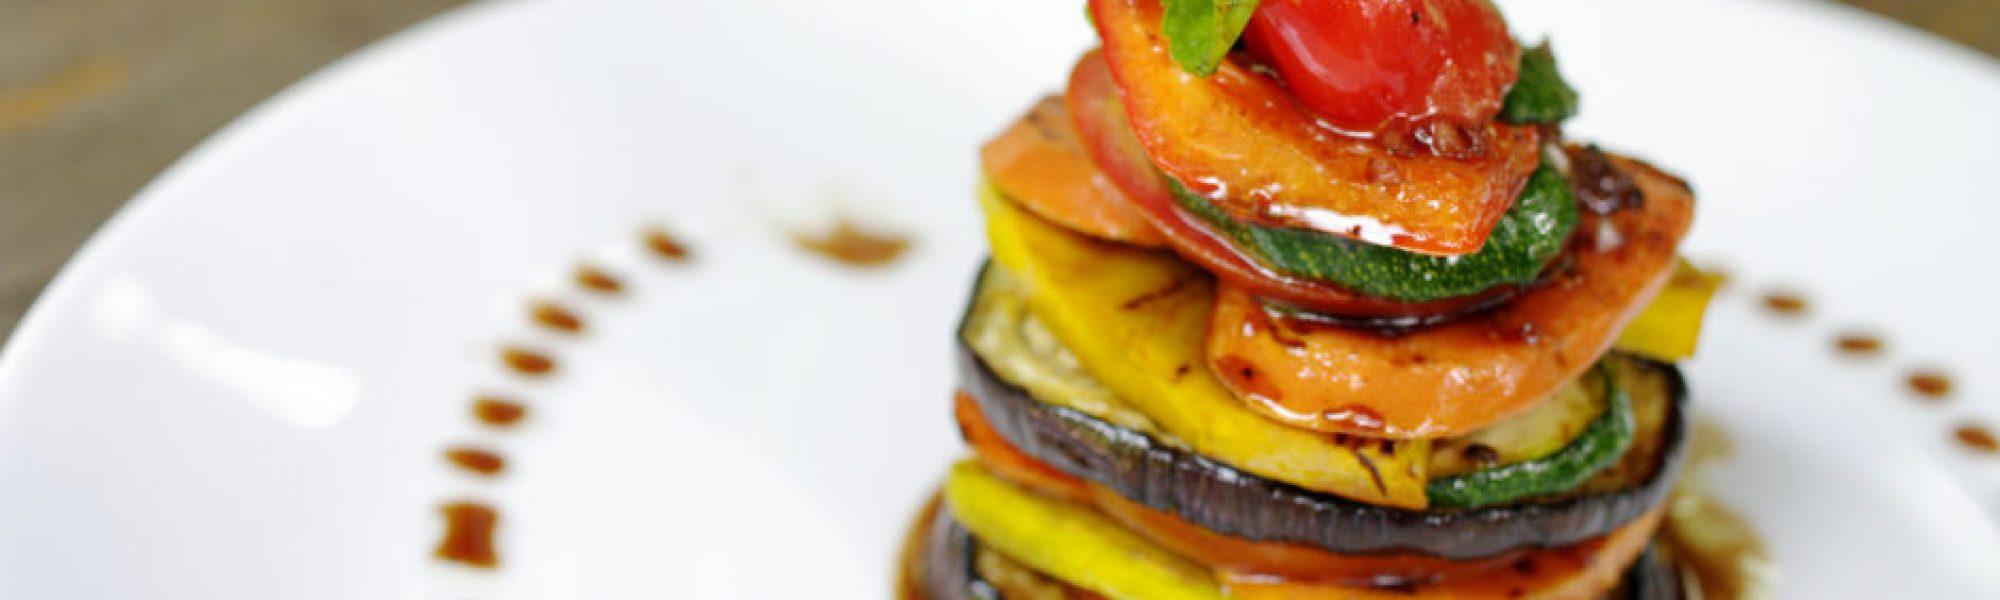 Daring To Be Different Vegetarian Vegan Gluten Free And